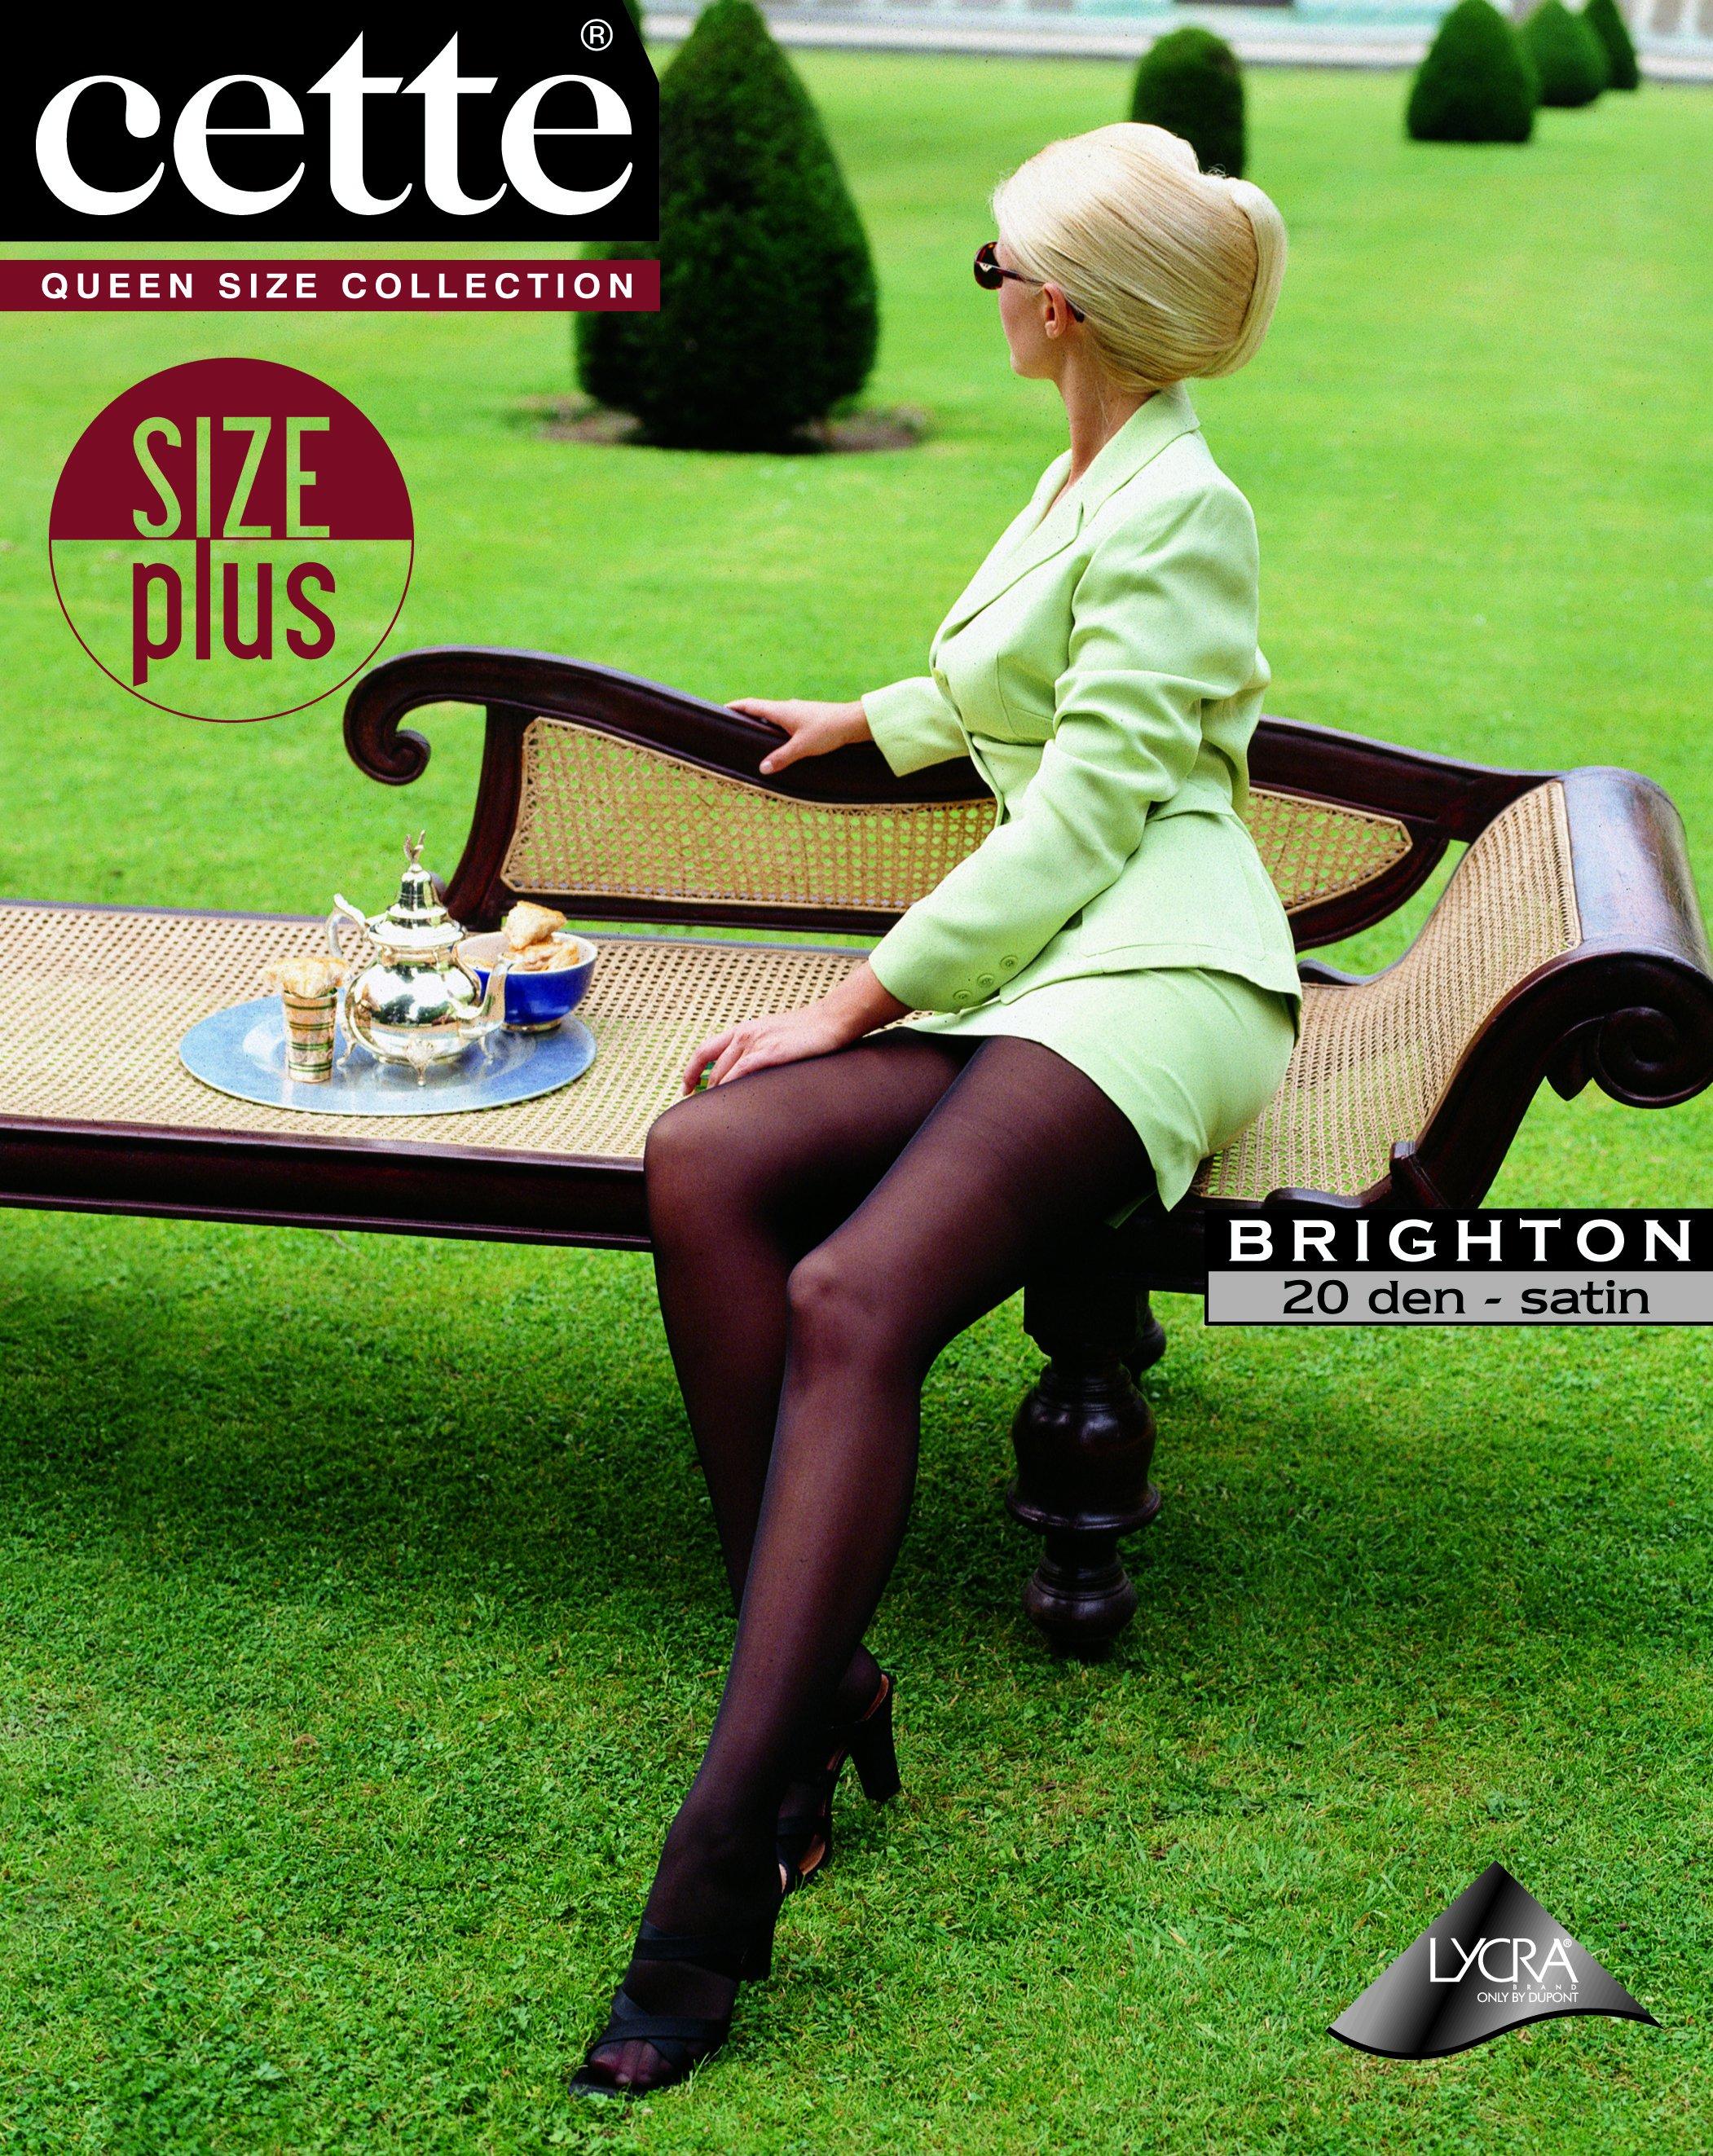 Pantyhose Onlineshop - Cette Brighton Size Plus Strumpfhose buy at ... 453965aea22